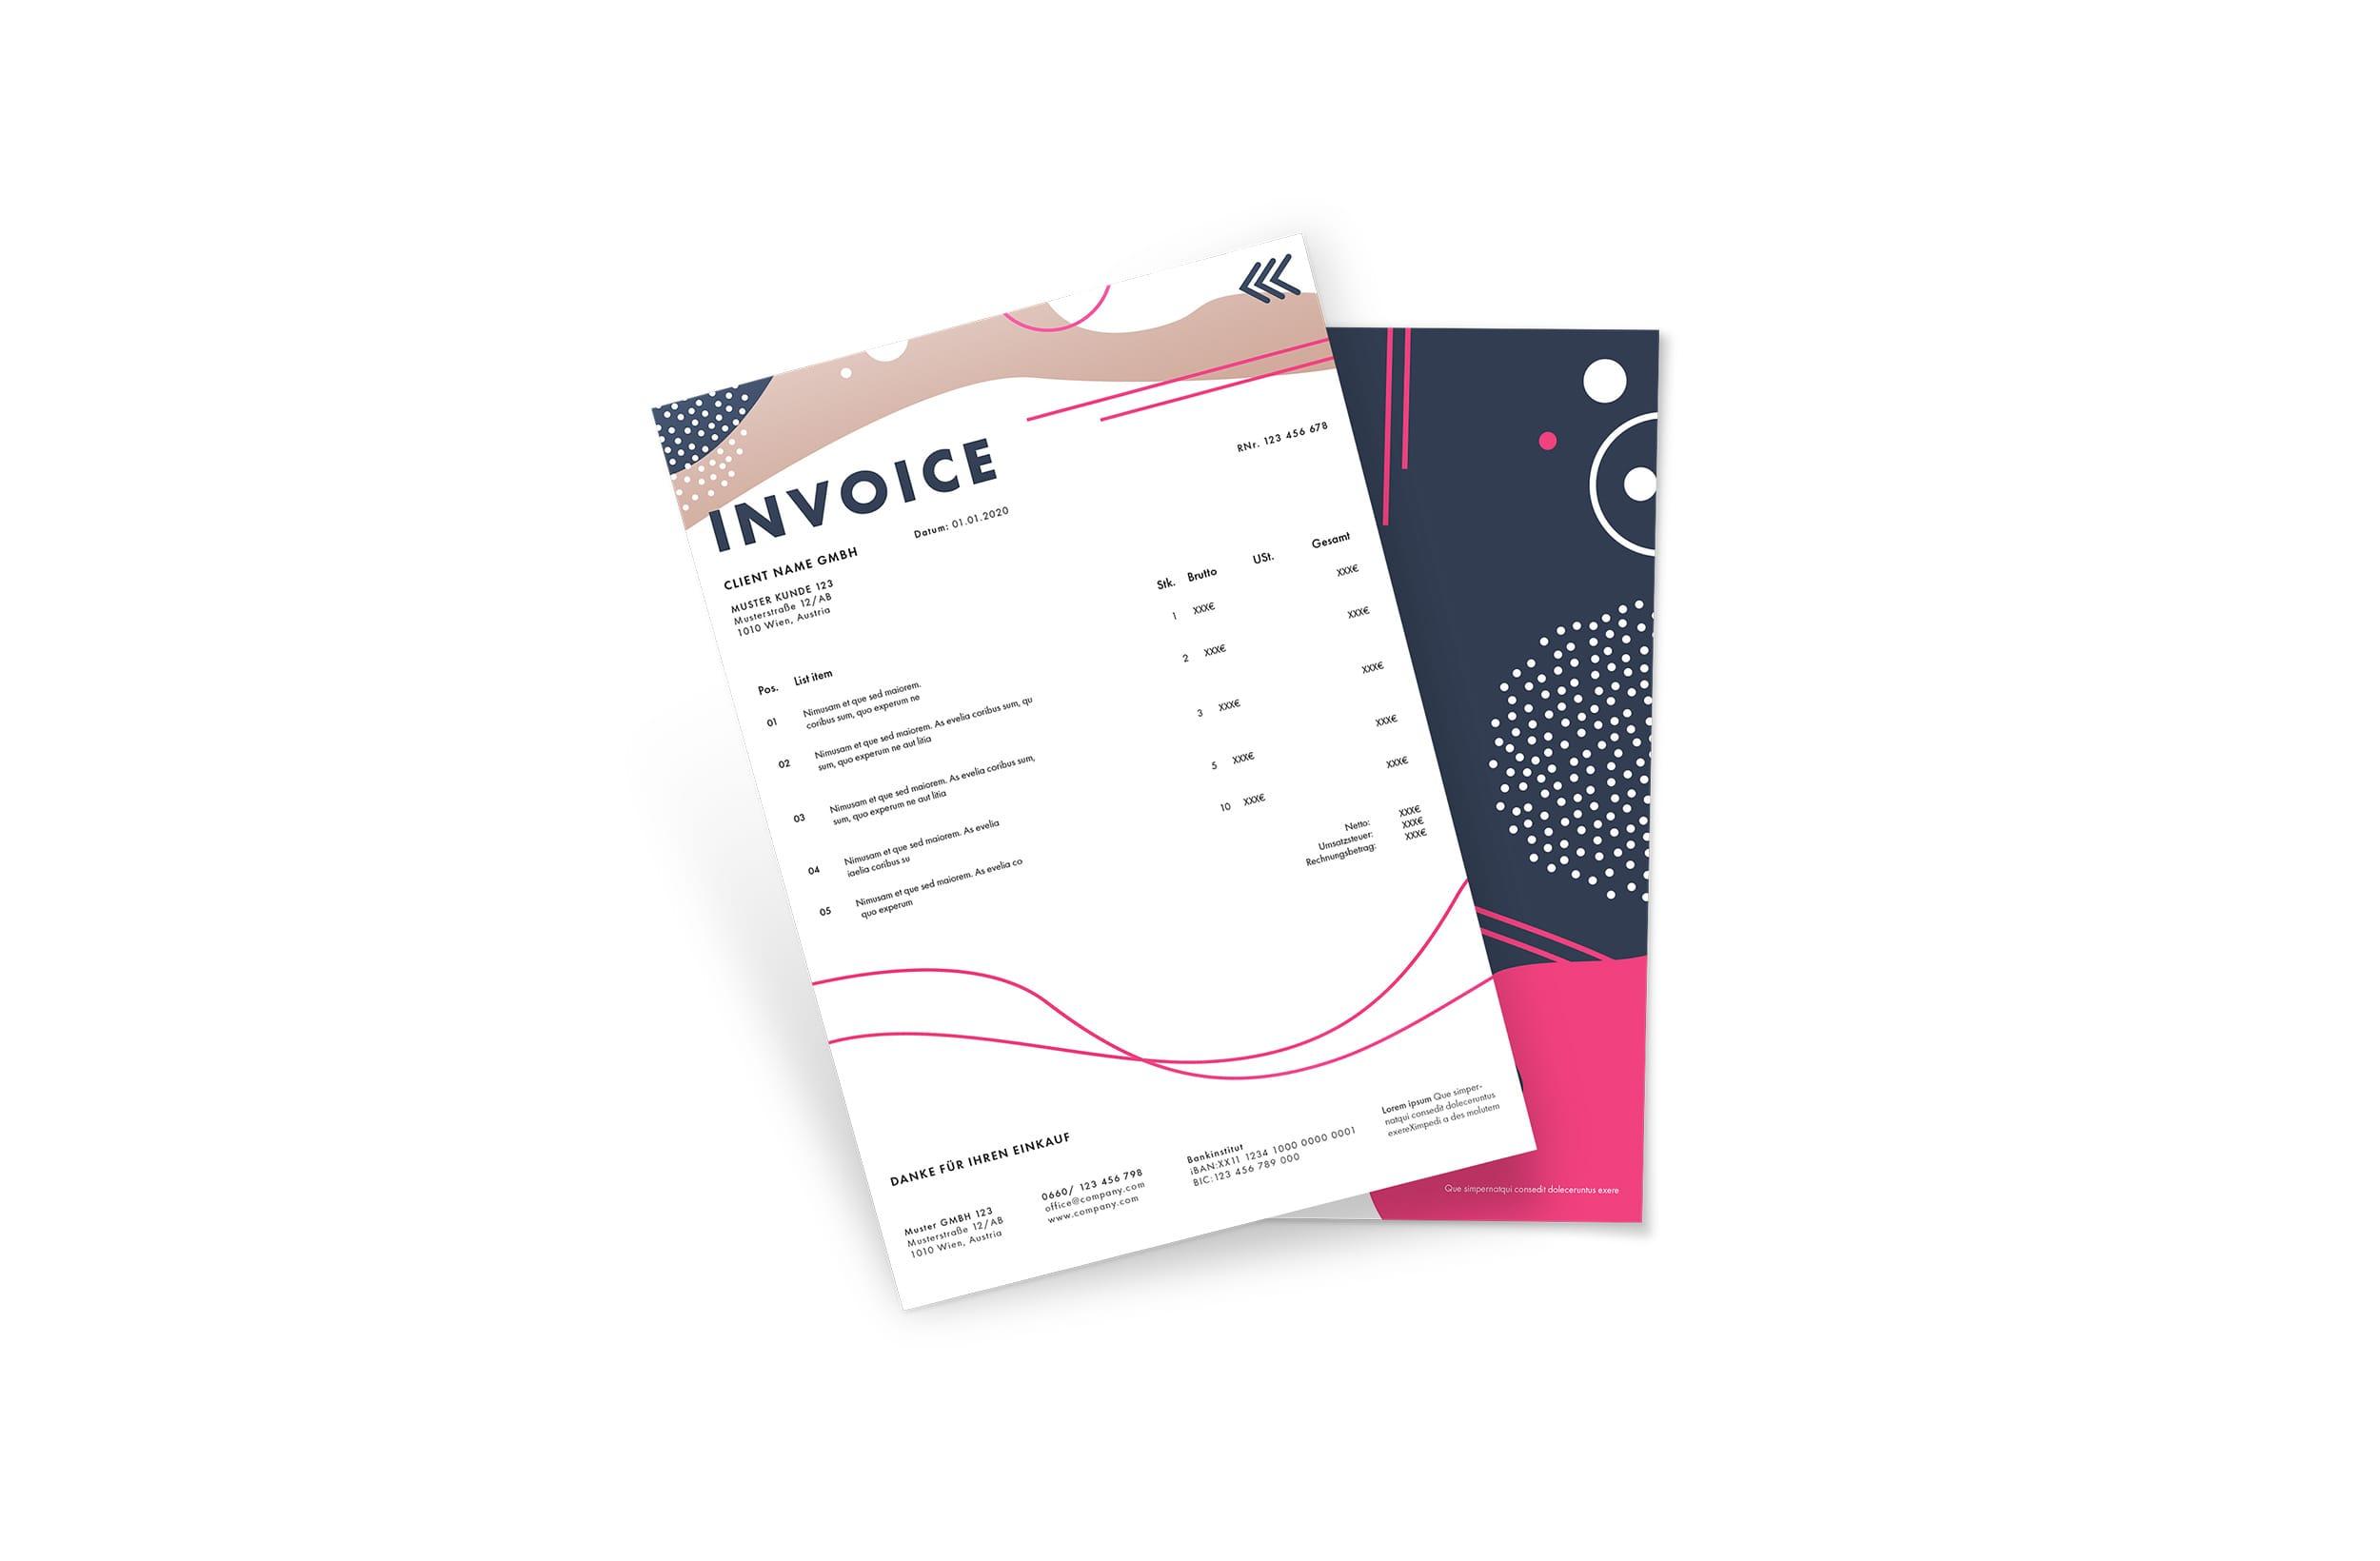 montroit-design-invoice-paper-spc-a